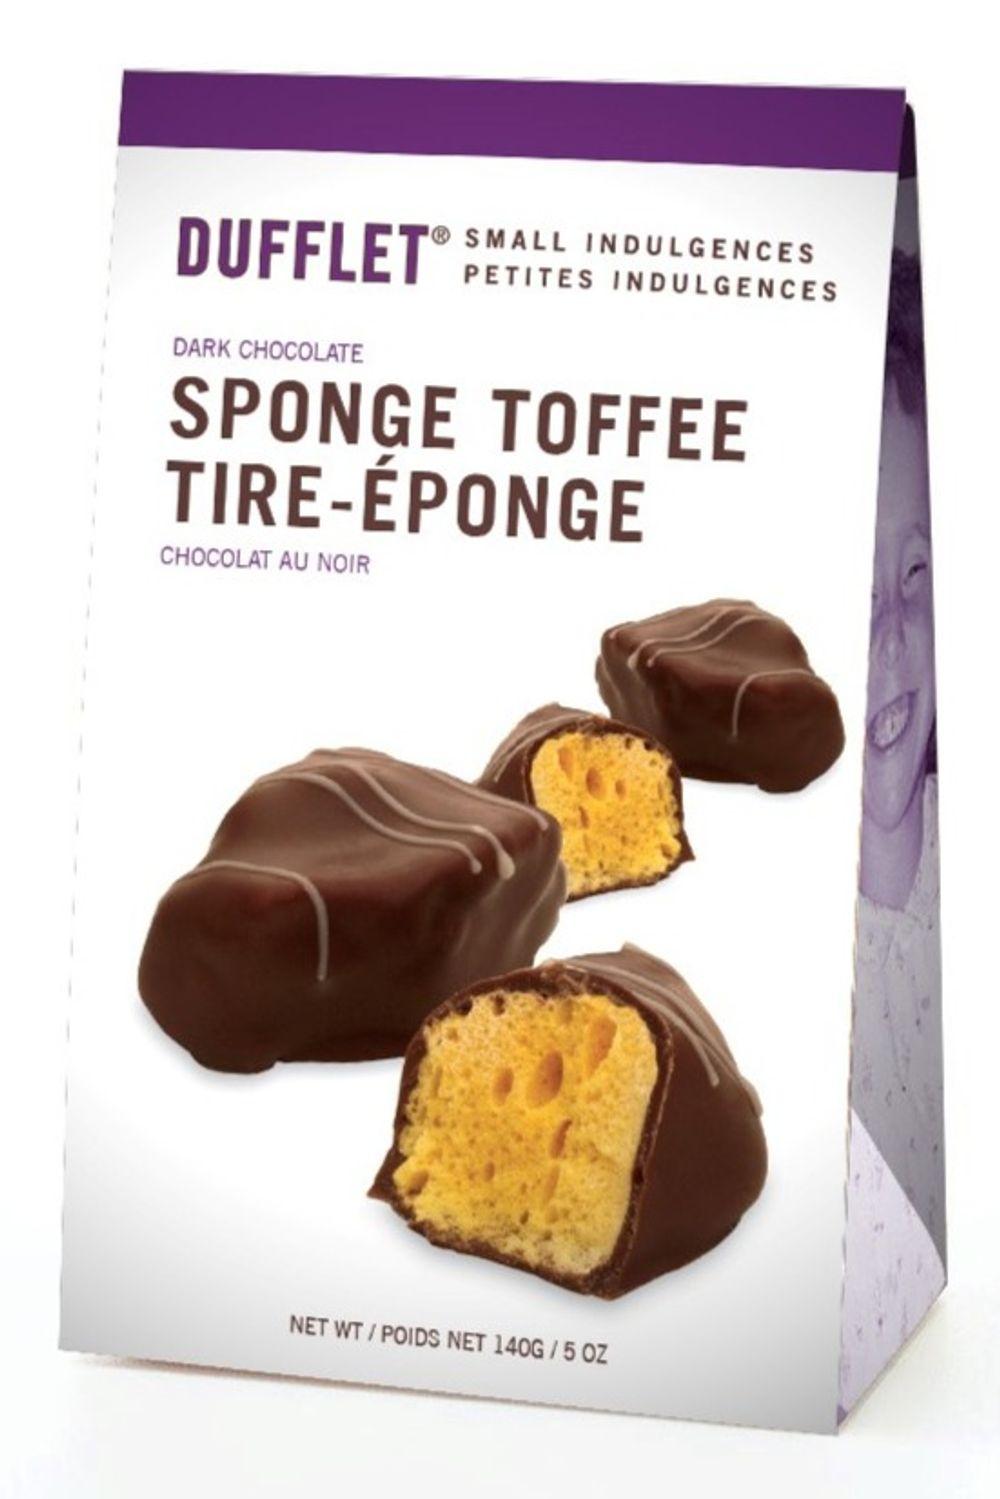 Dark Chocolate Sponge Toffee